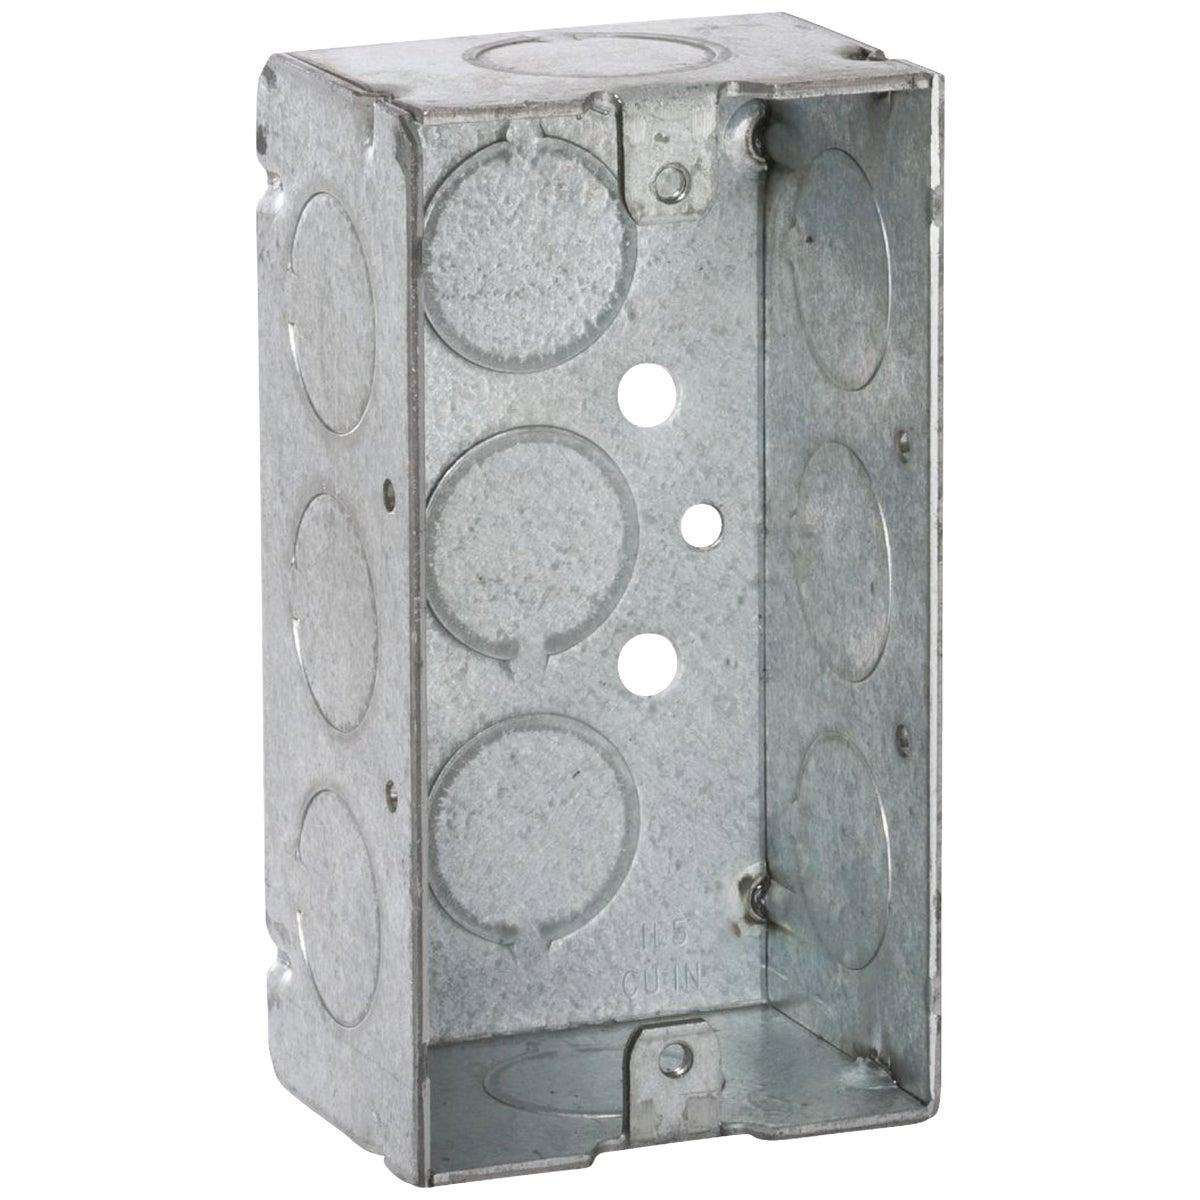 4X2-1/8X1-1/2 BOX - 583511/2 by Thomas & Betts